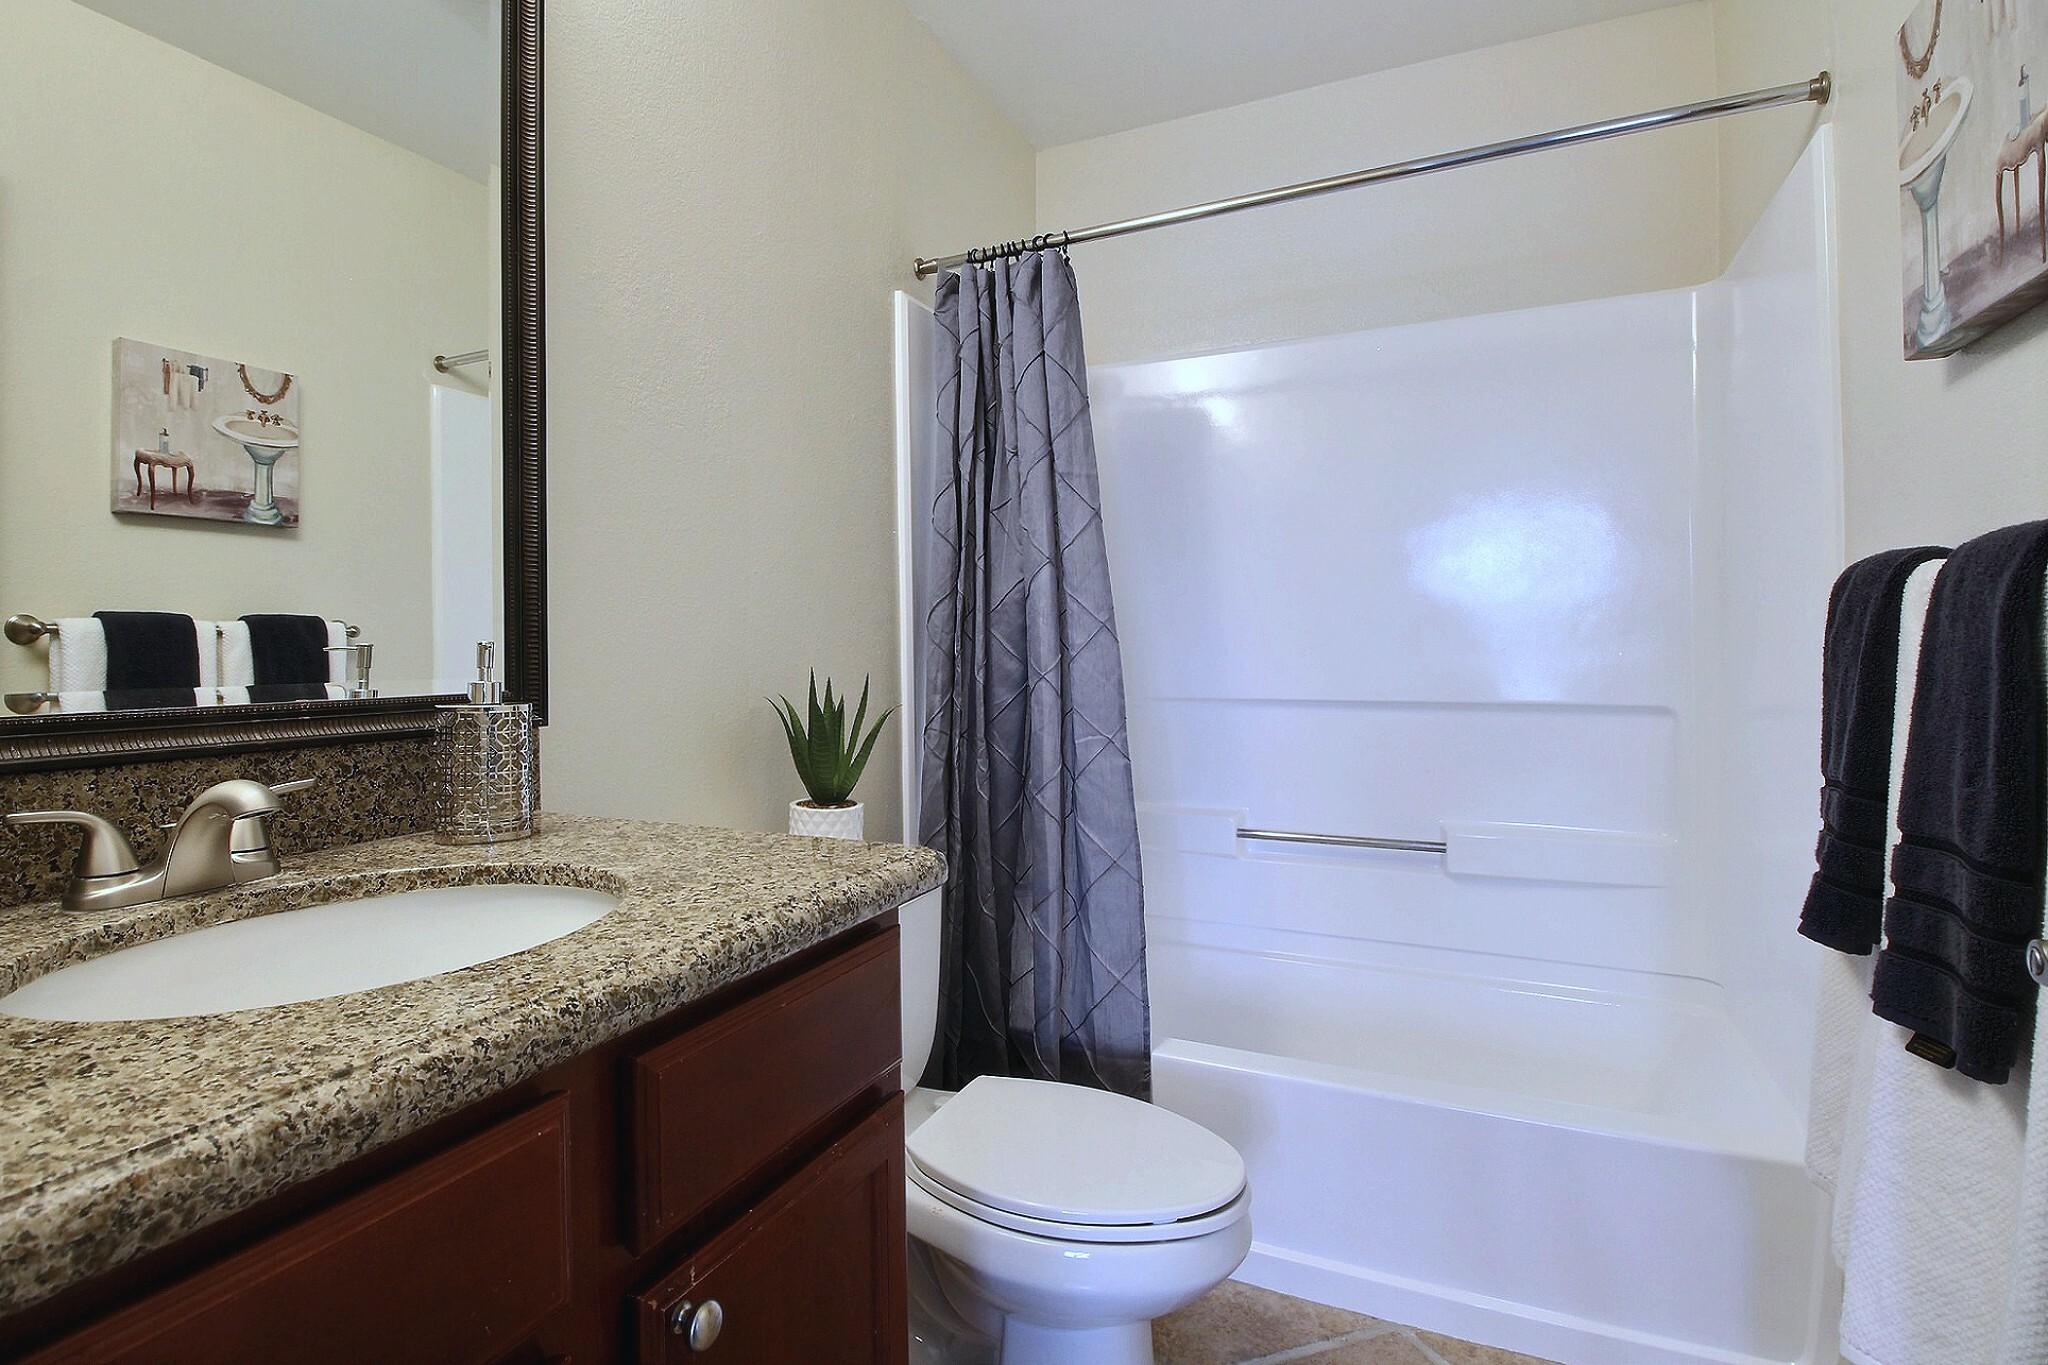 exposio_06_master_bathroom_01_973_catkin_ct_s